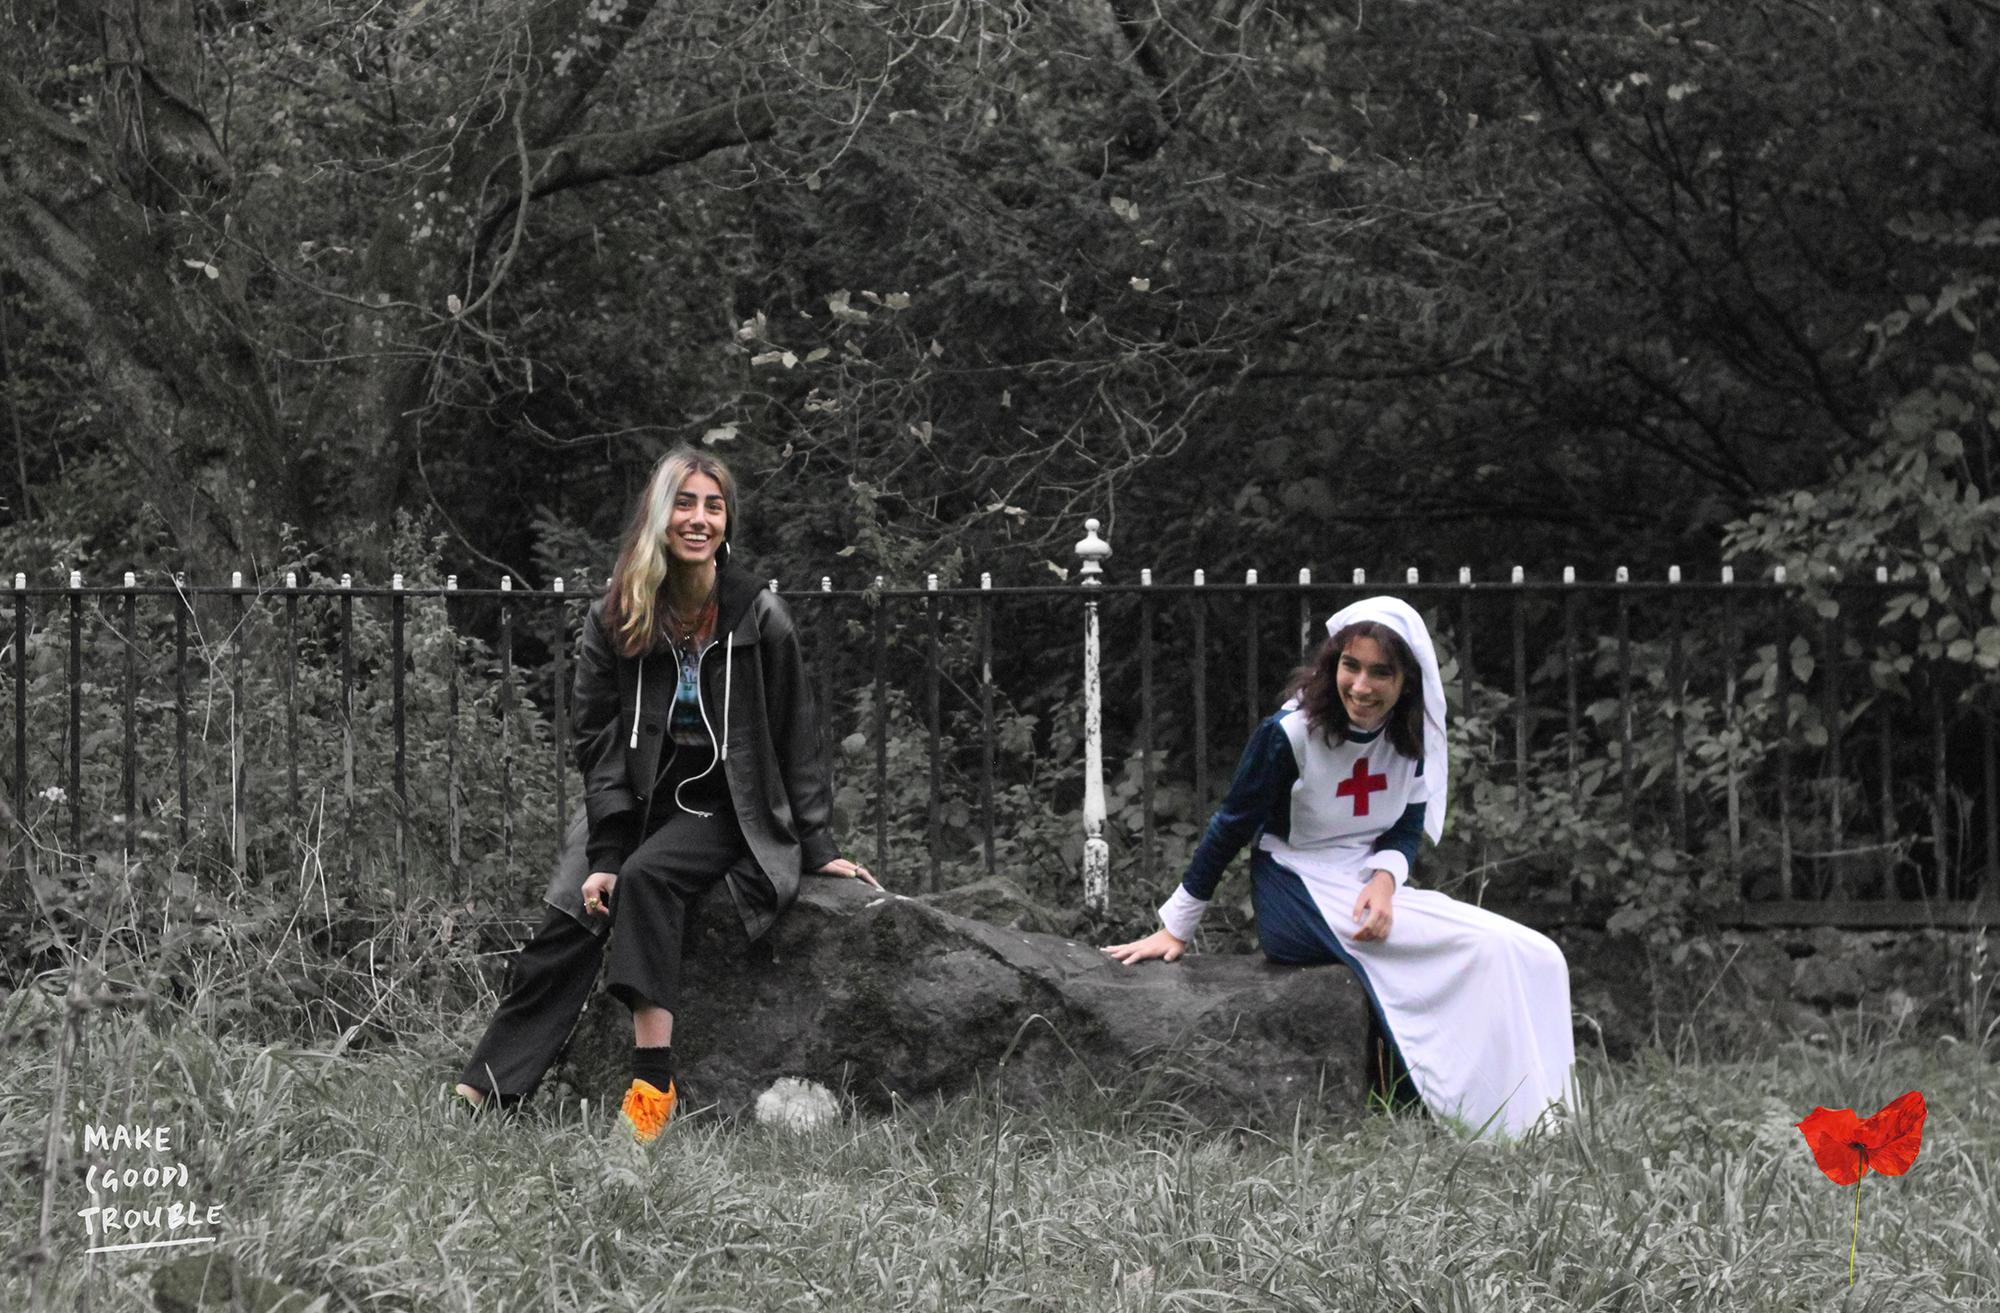 Teens in modern and WW1 dress